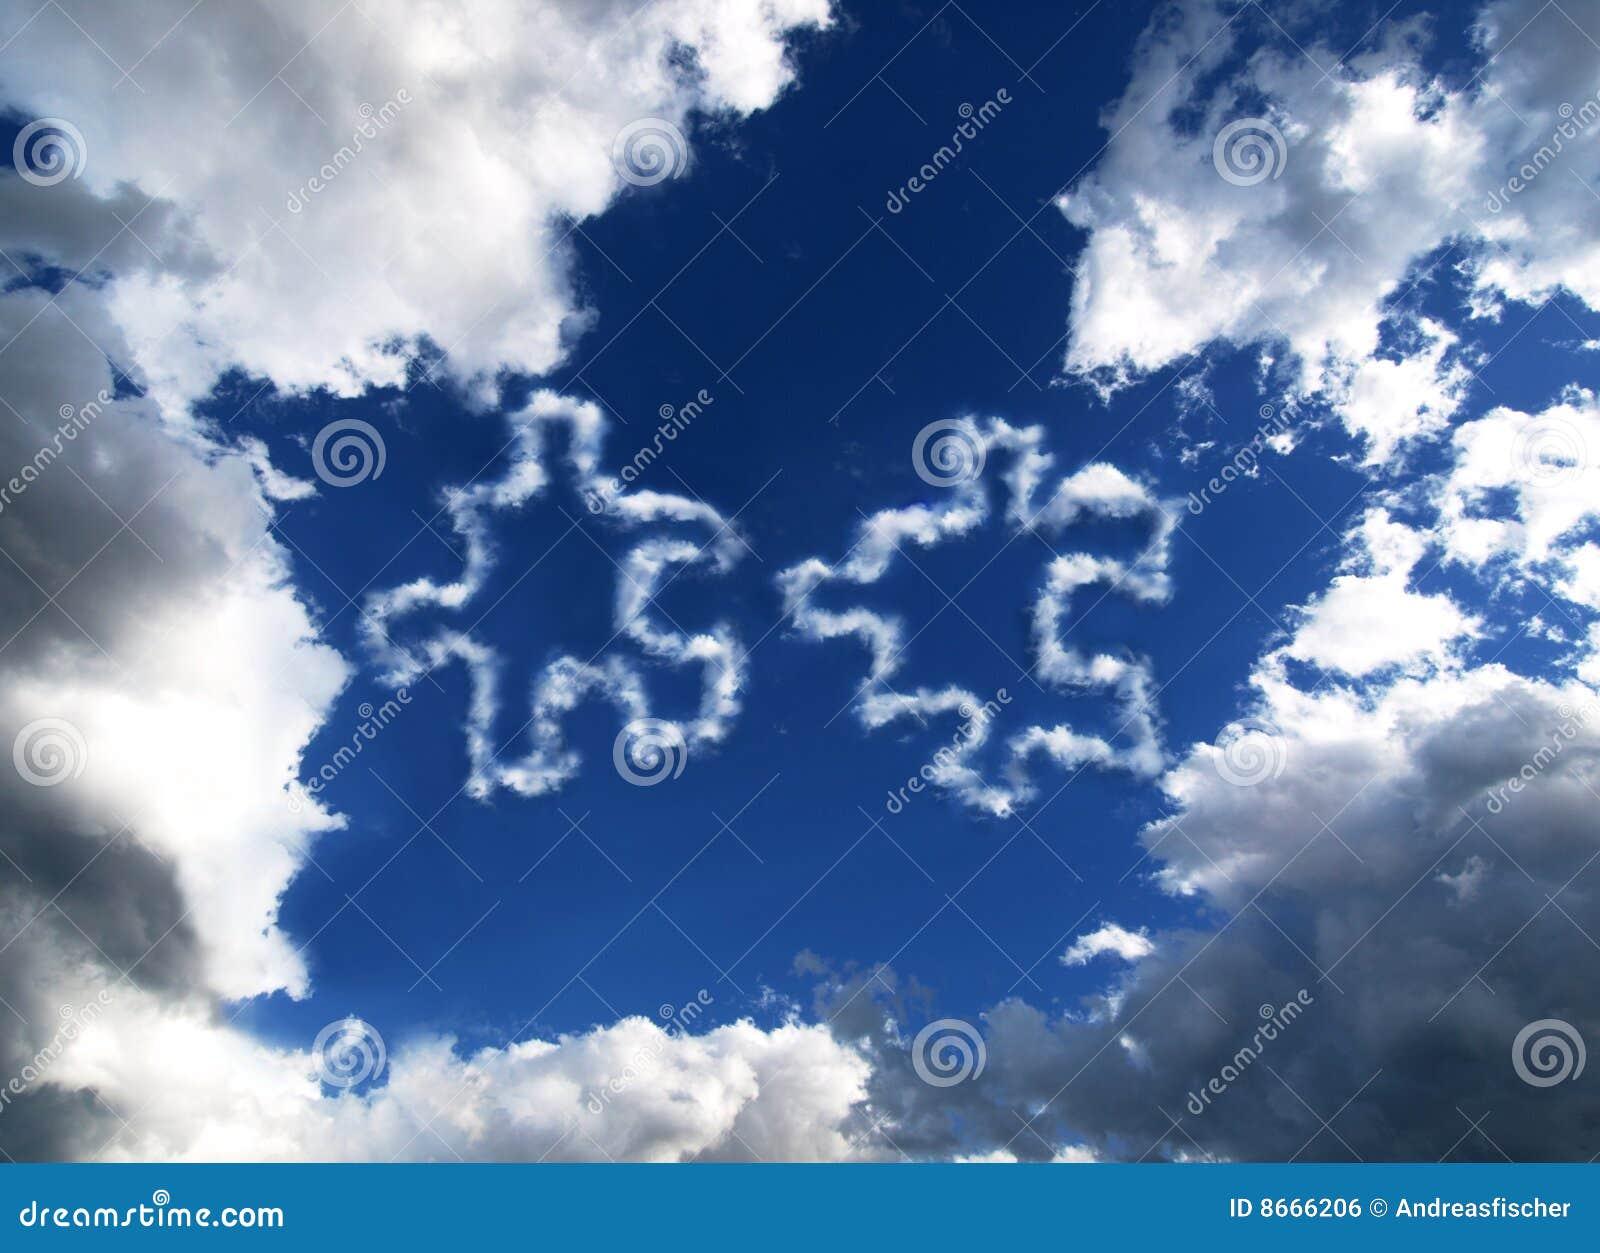 Puzzle de ciel